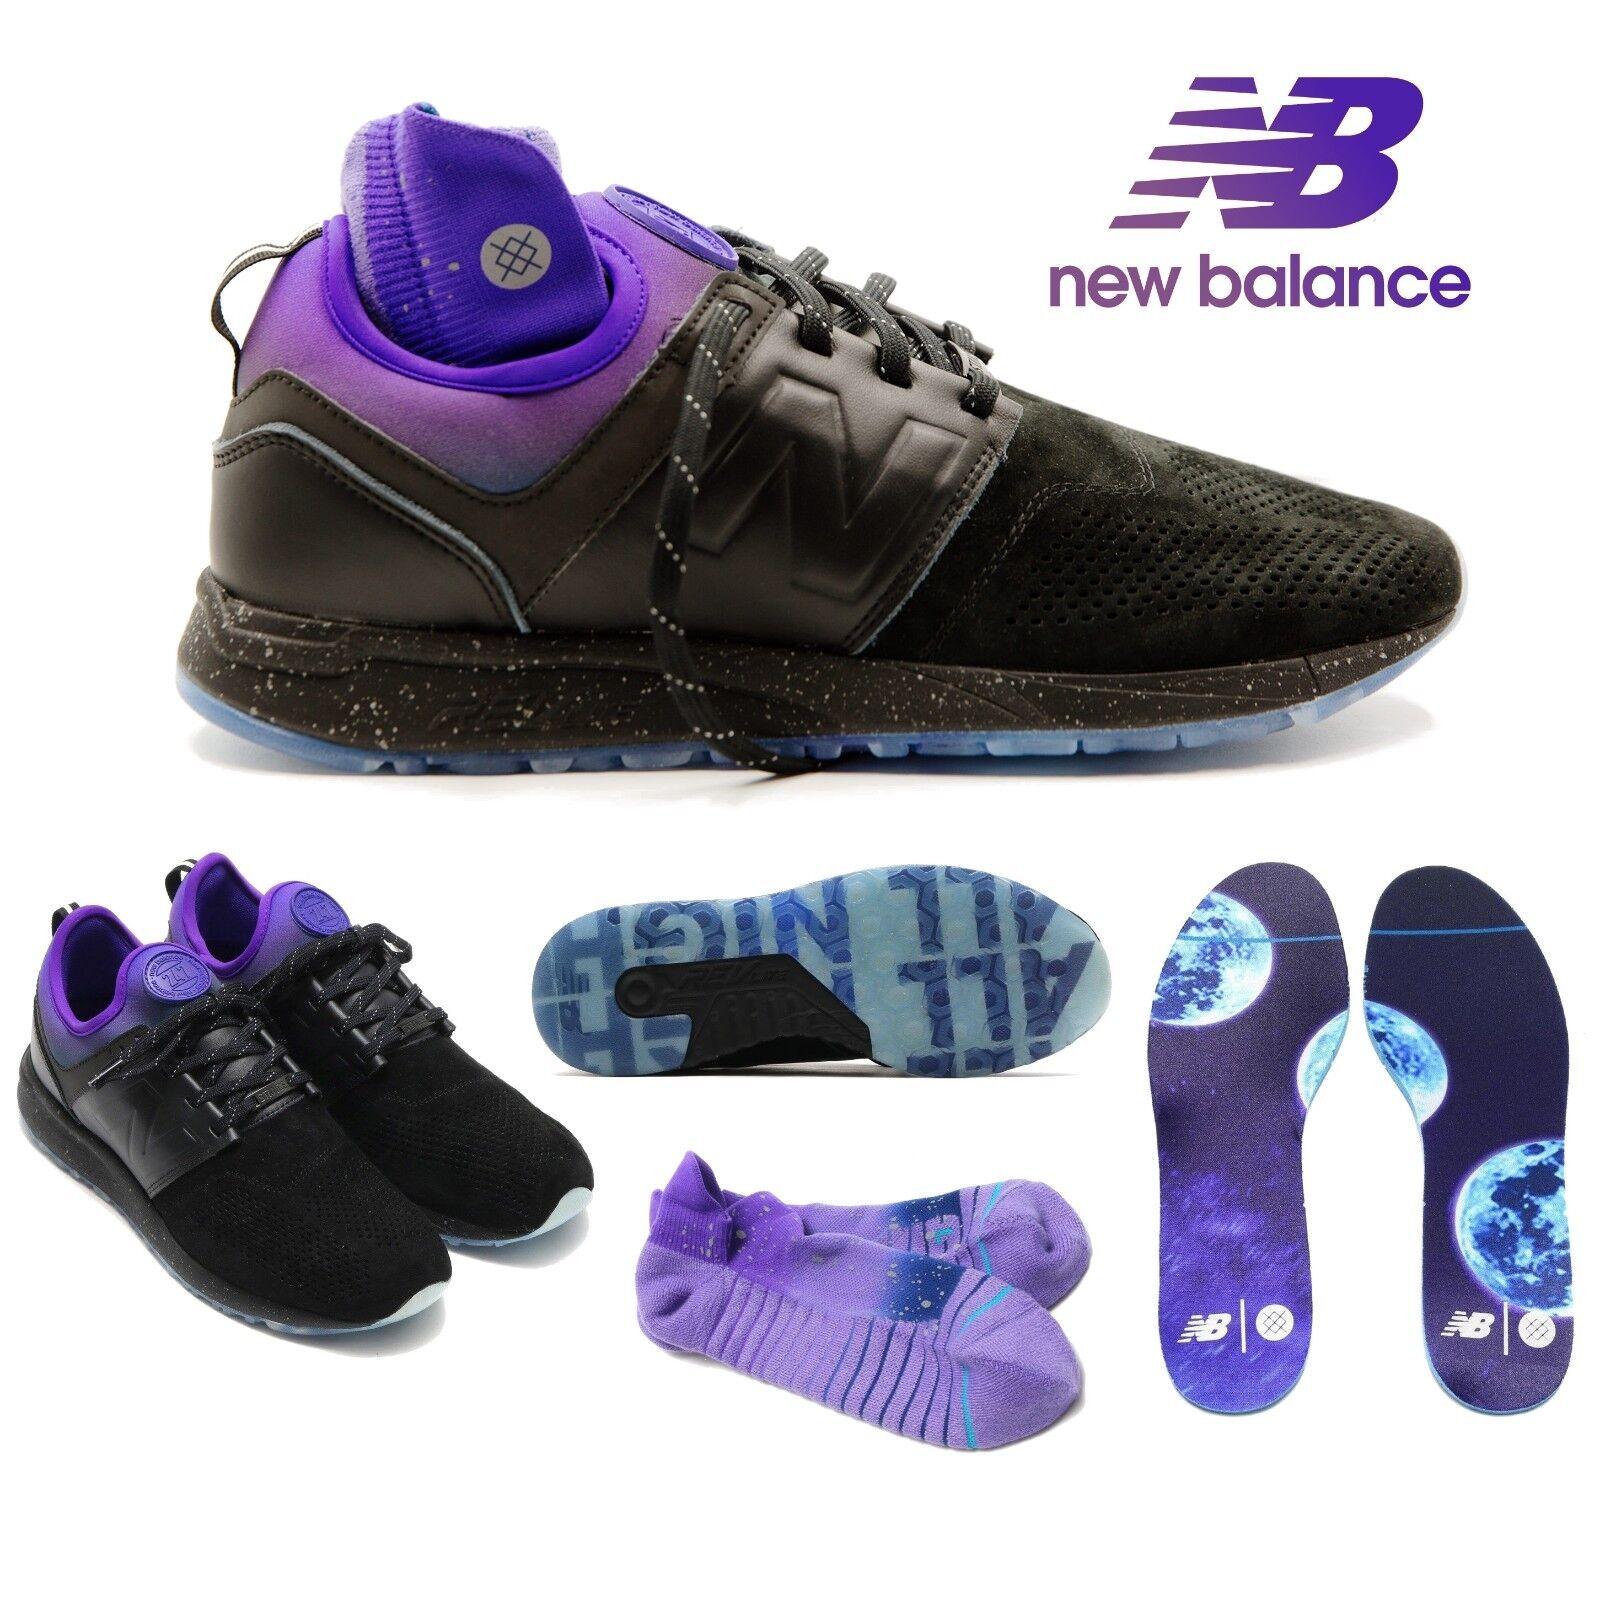 New Balance X Stance 247 Men's shoes All Night Black Socks MRL247ST  150 Limited